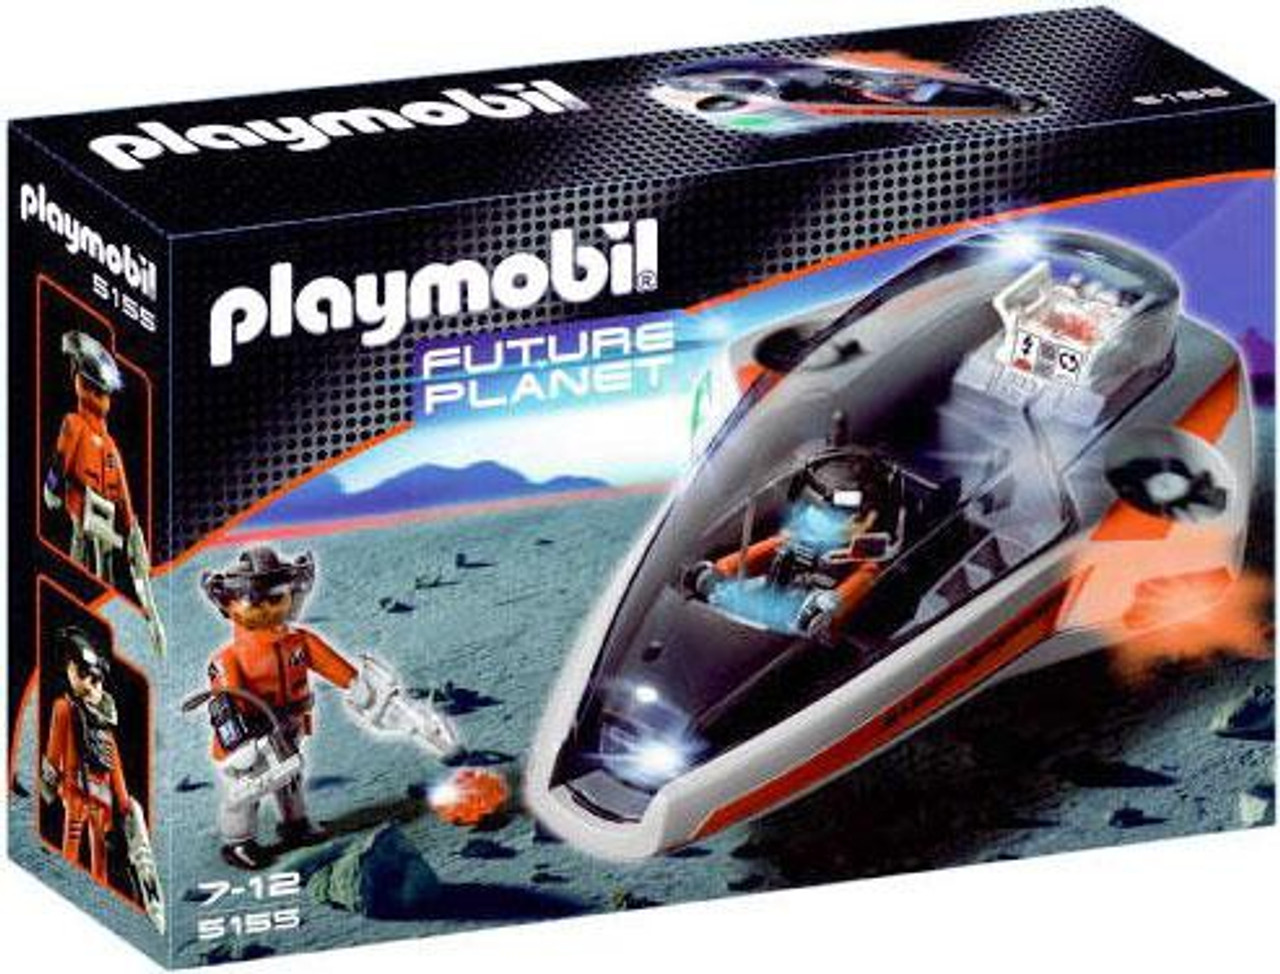 Playmobil Future Planet Dark Rangers' Speed Glider Set #5155